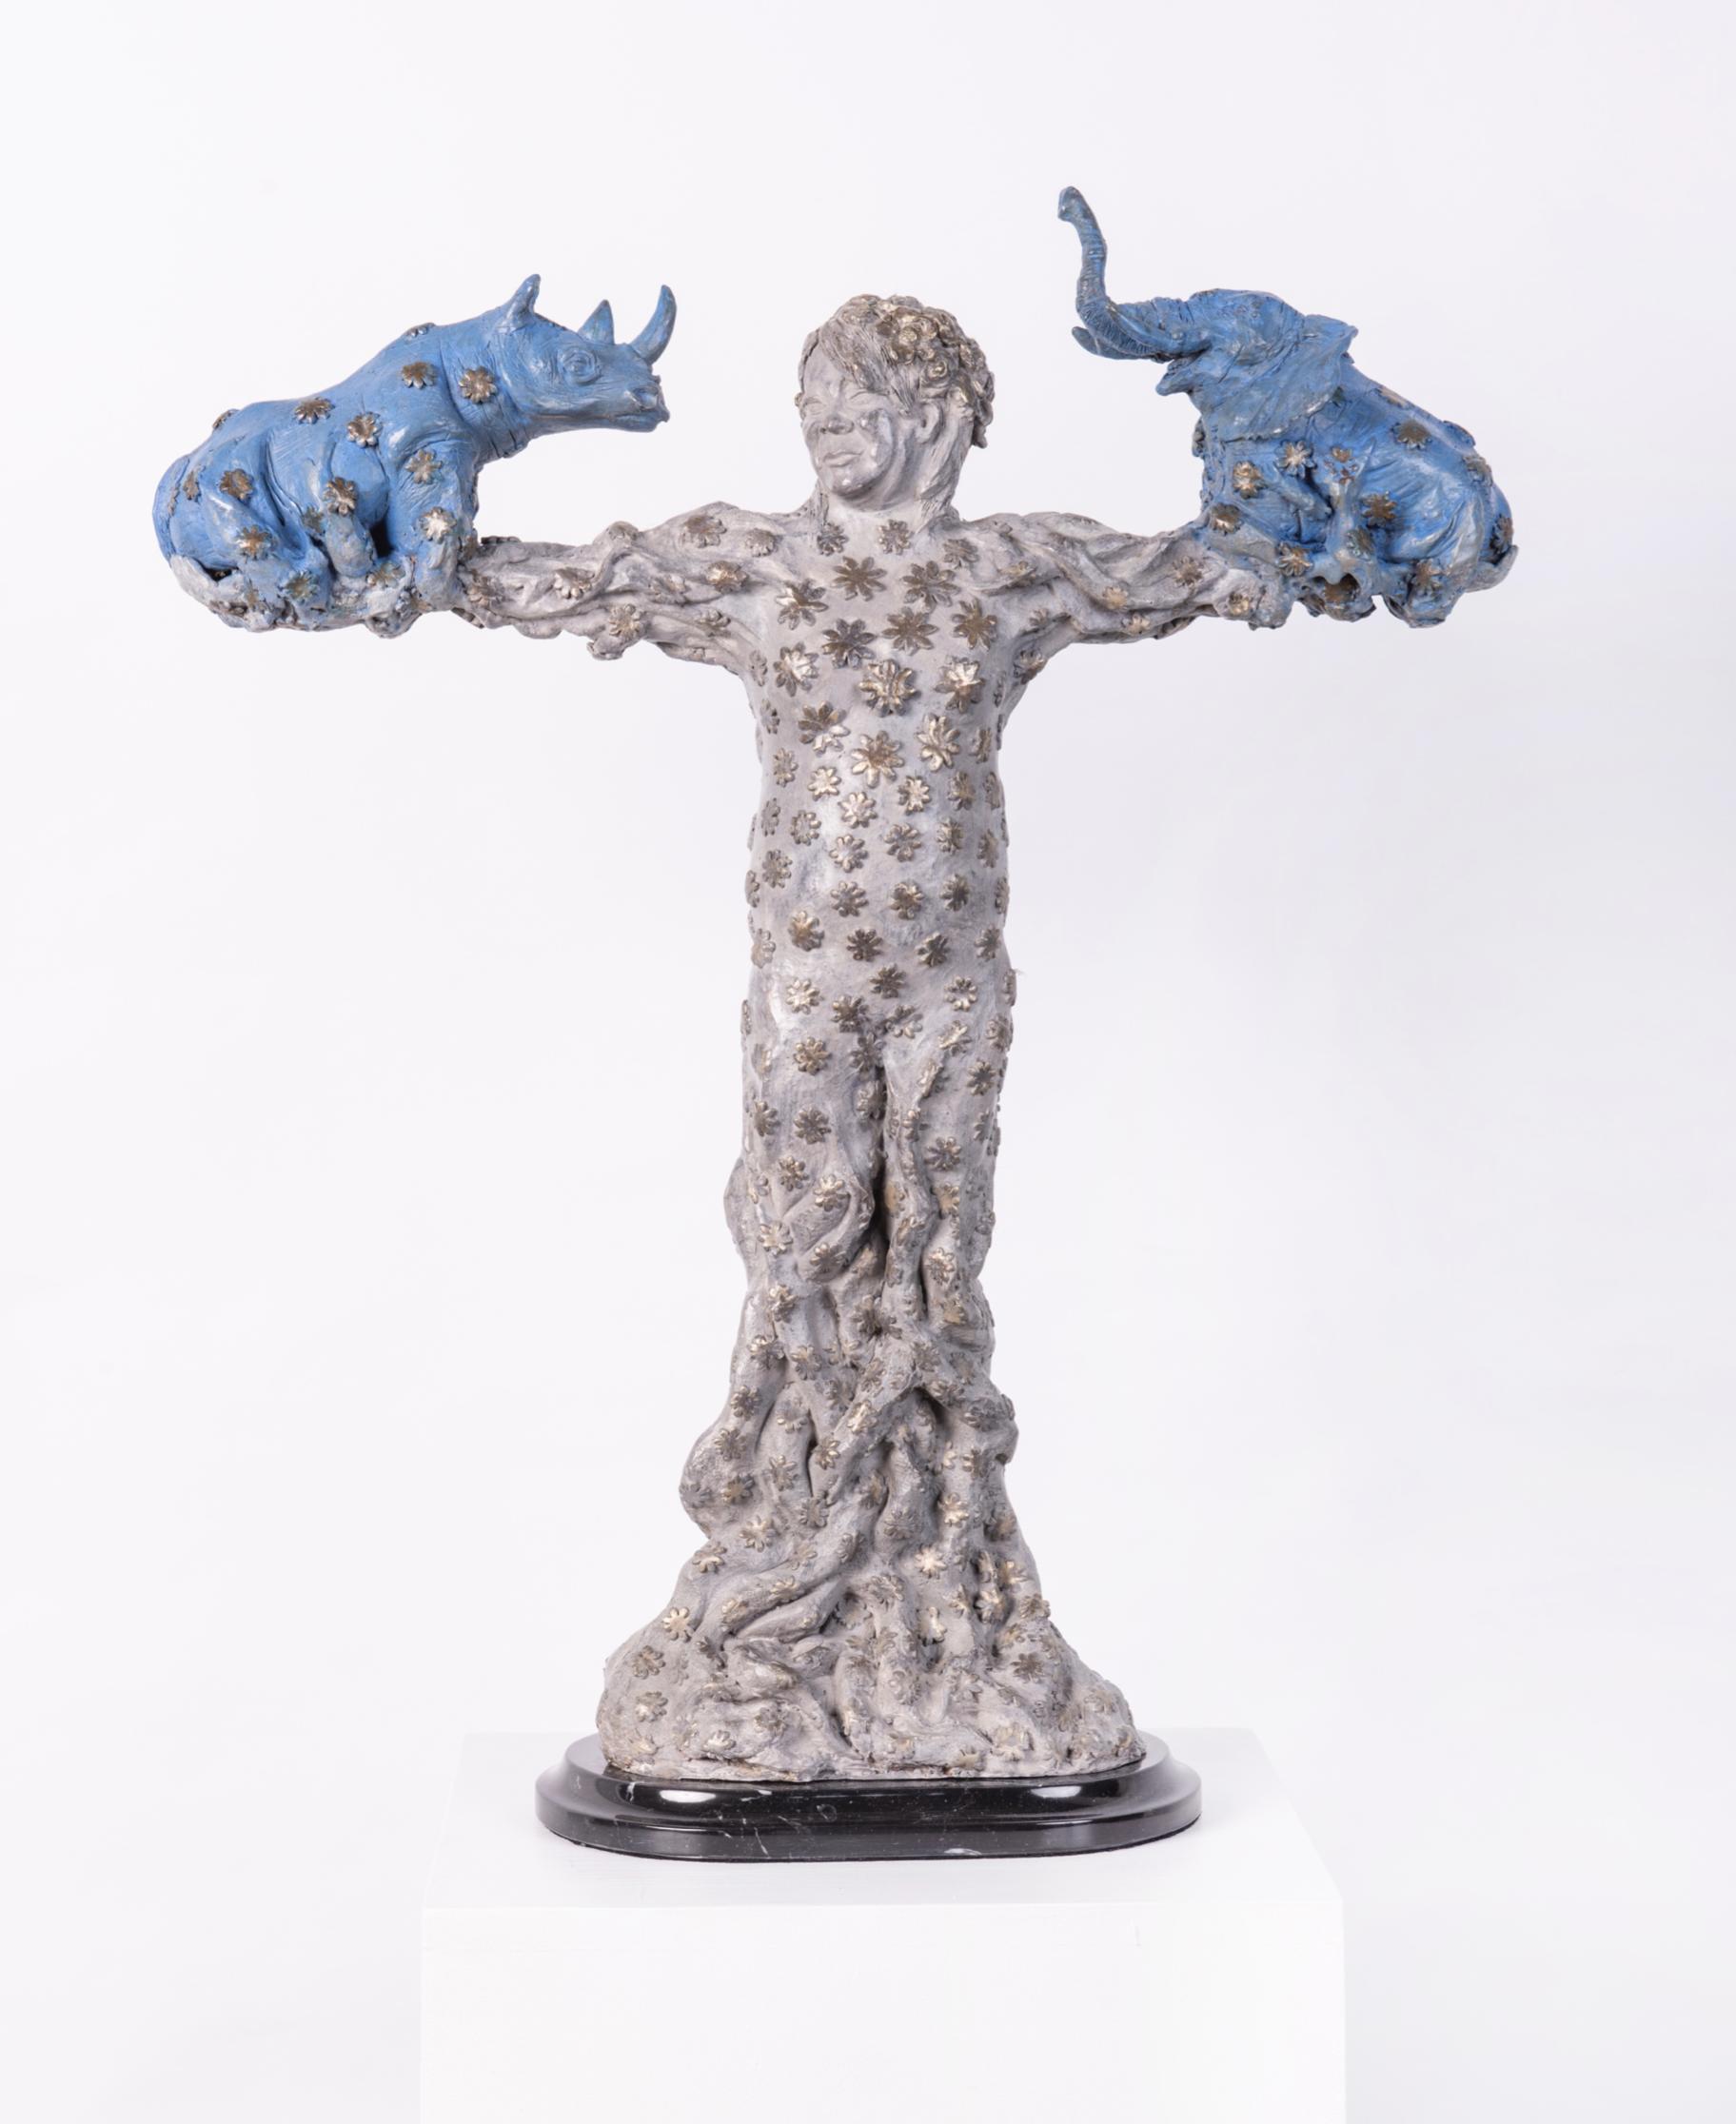 "Título:  ""El Amuleto"", 2018.   Autor:  Alejandra Zermeño.   Técnica:  Bronce a la cera perdida.   Medidas:  54 x 45 x 15 cm."